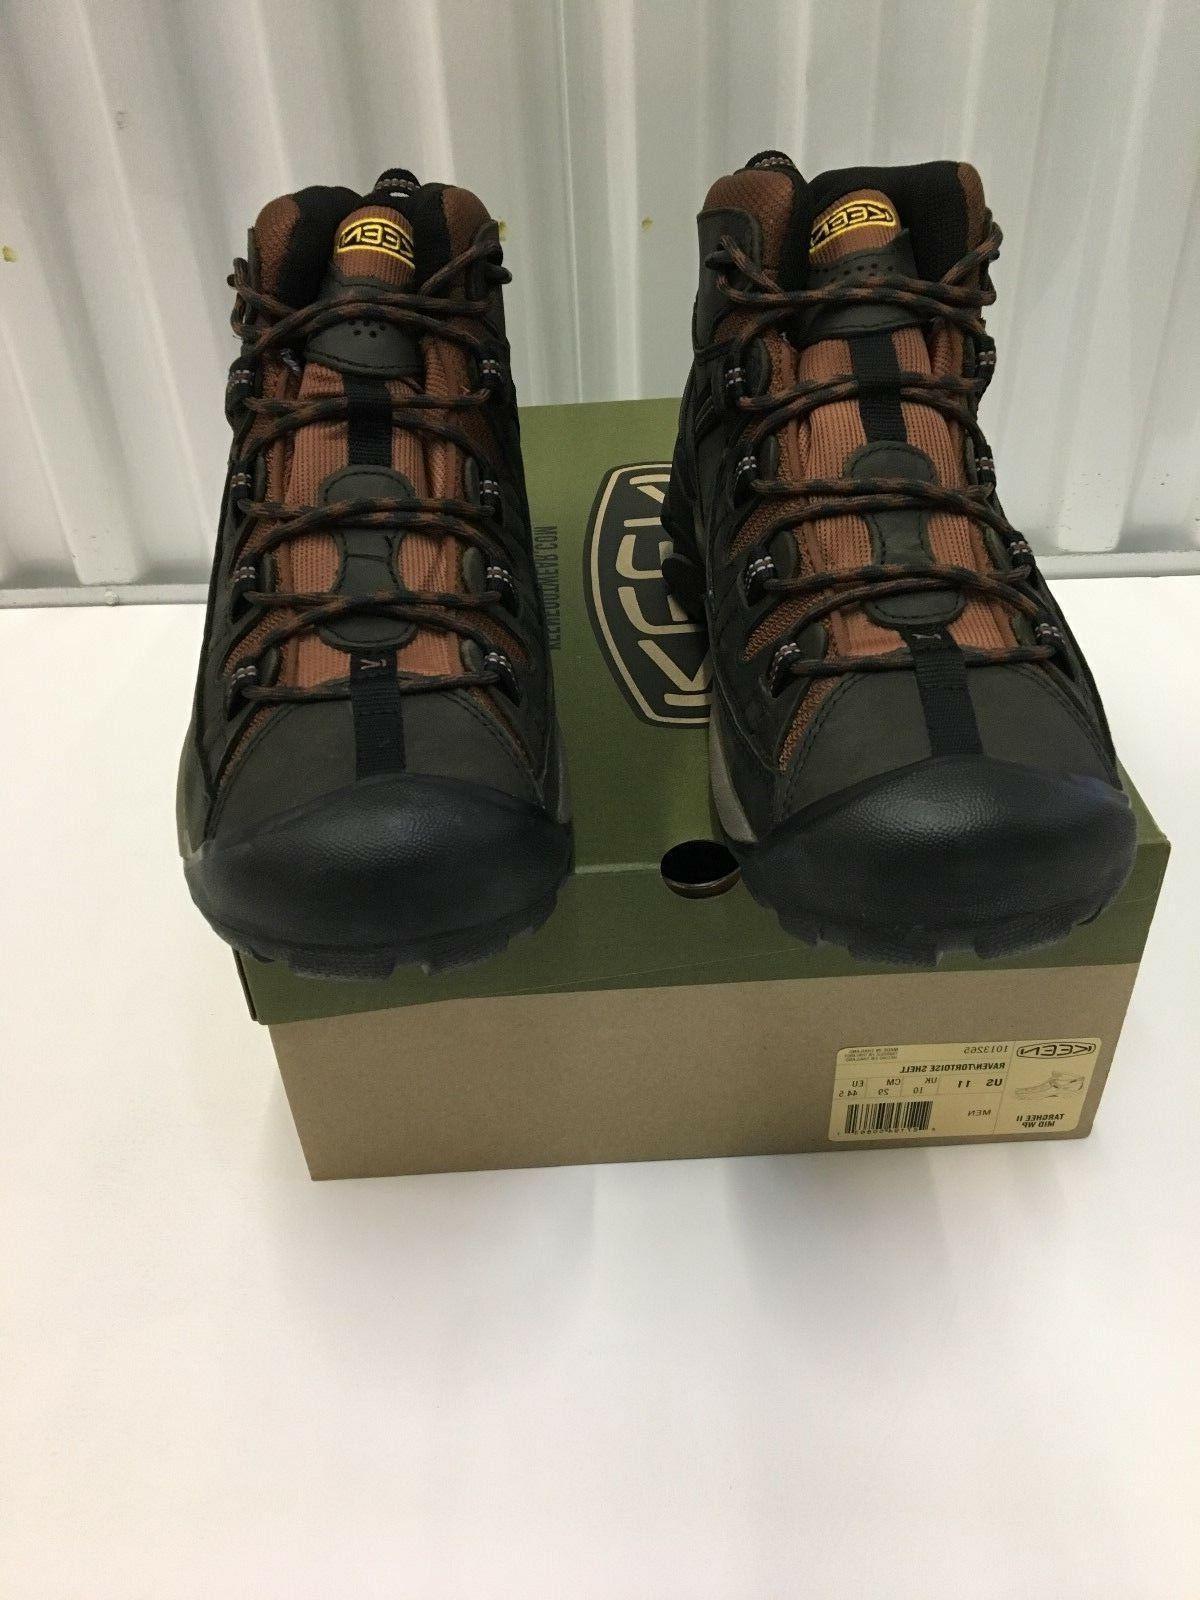 Keen II Waterproof Hiking Boots Raven/Tortois